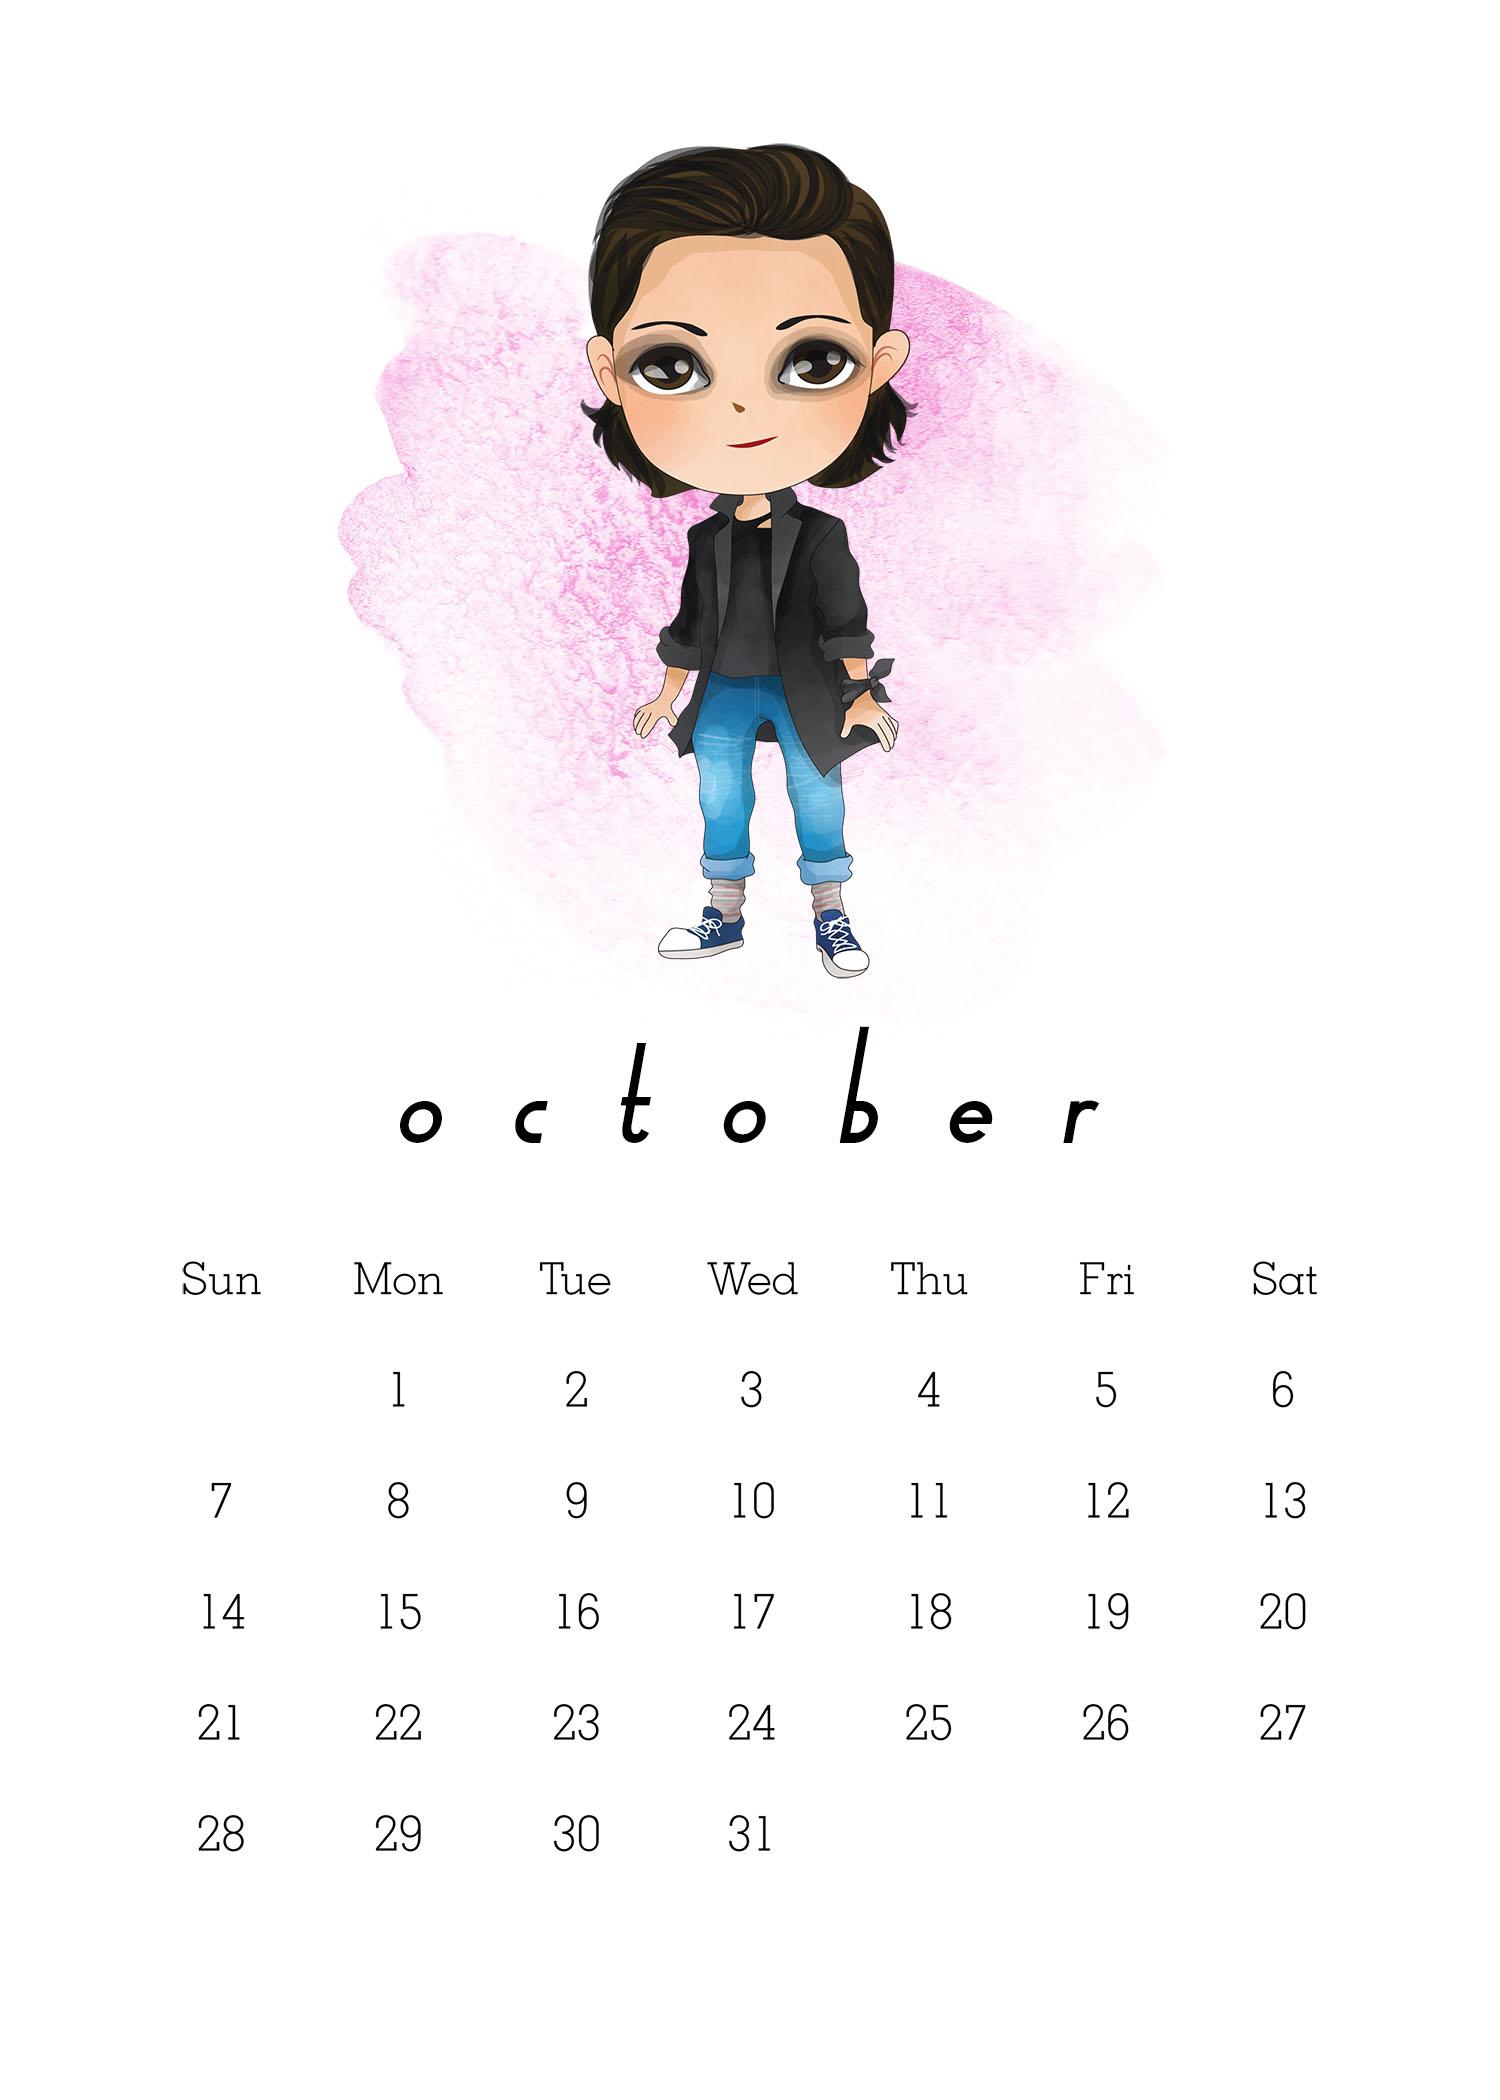 Free Printable 2018 Stranger Things Calendar - The Cottage ...